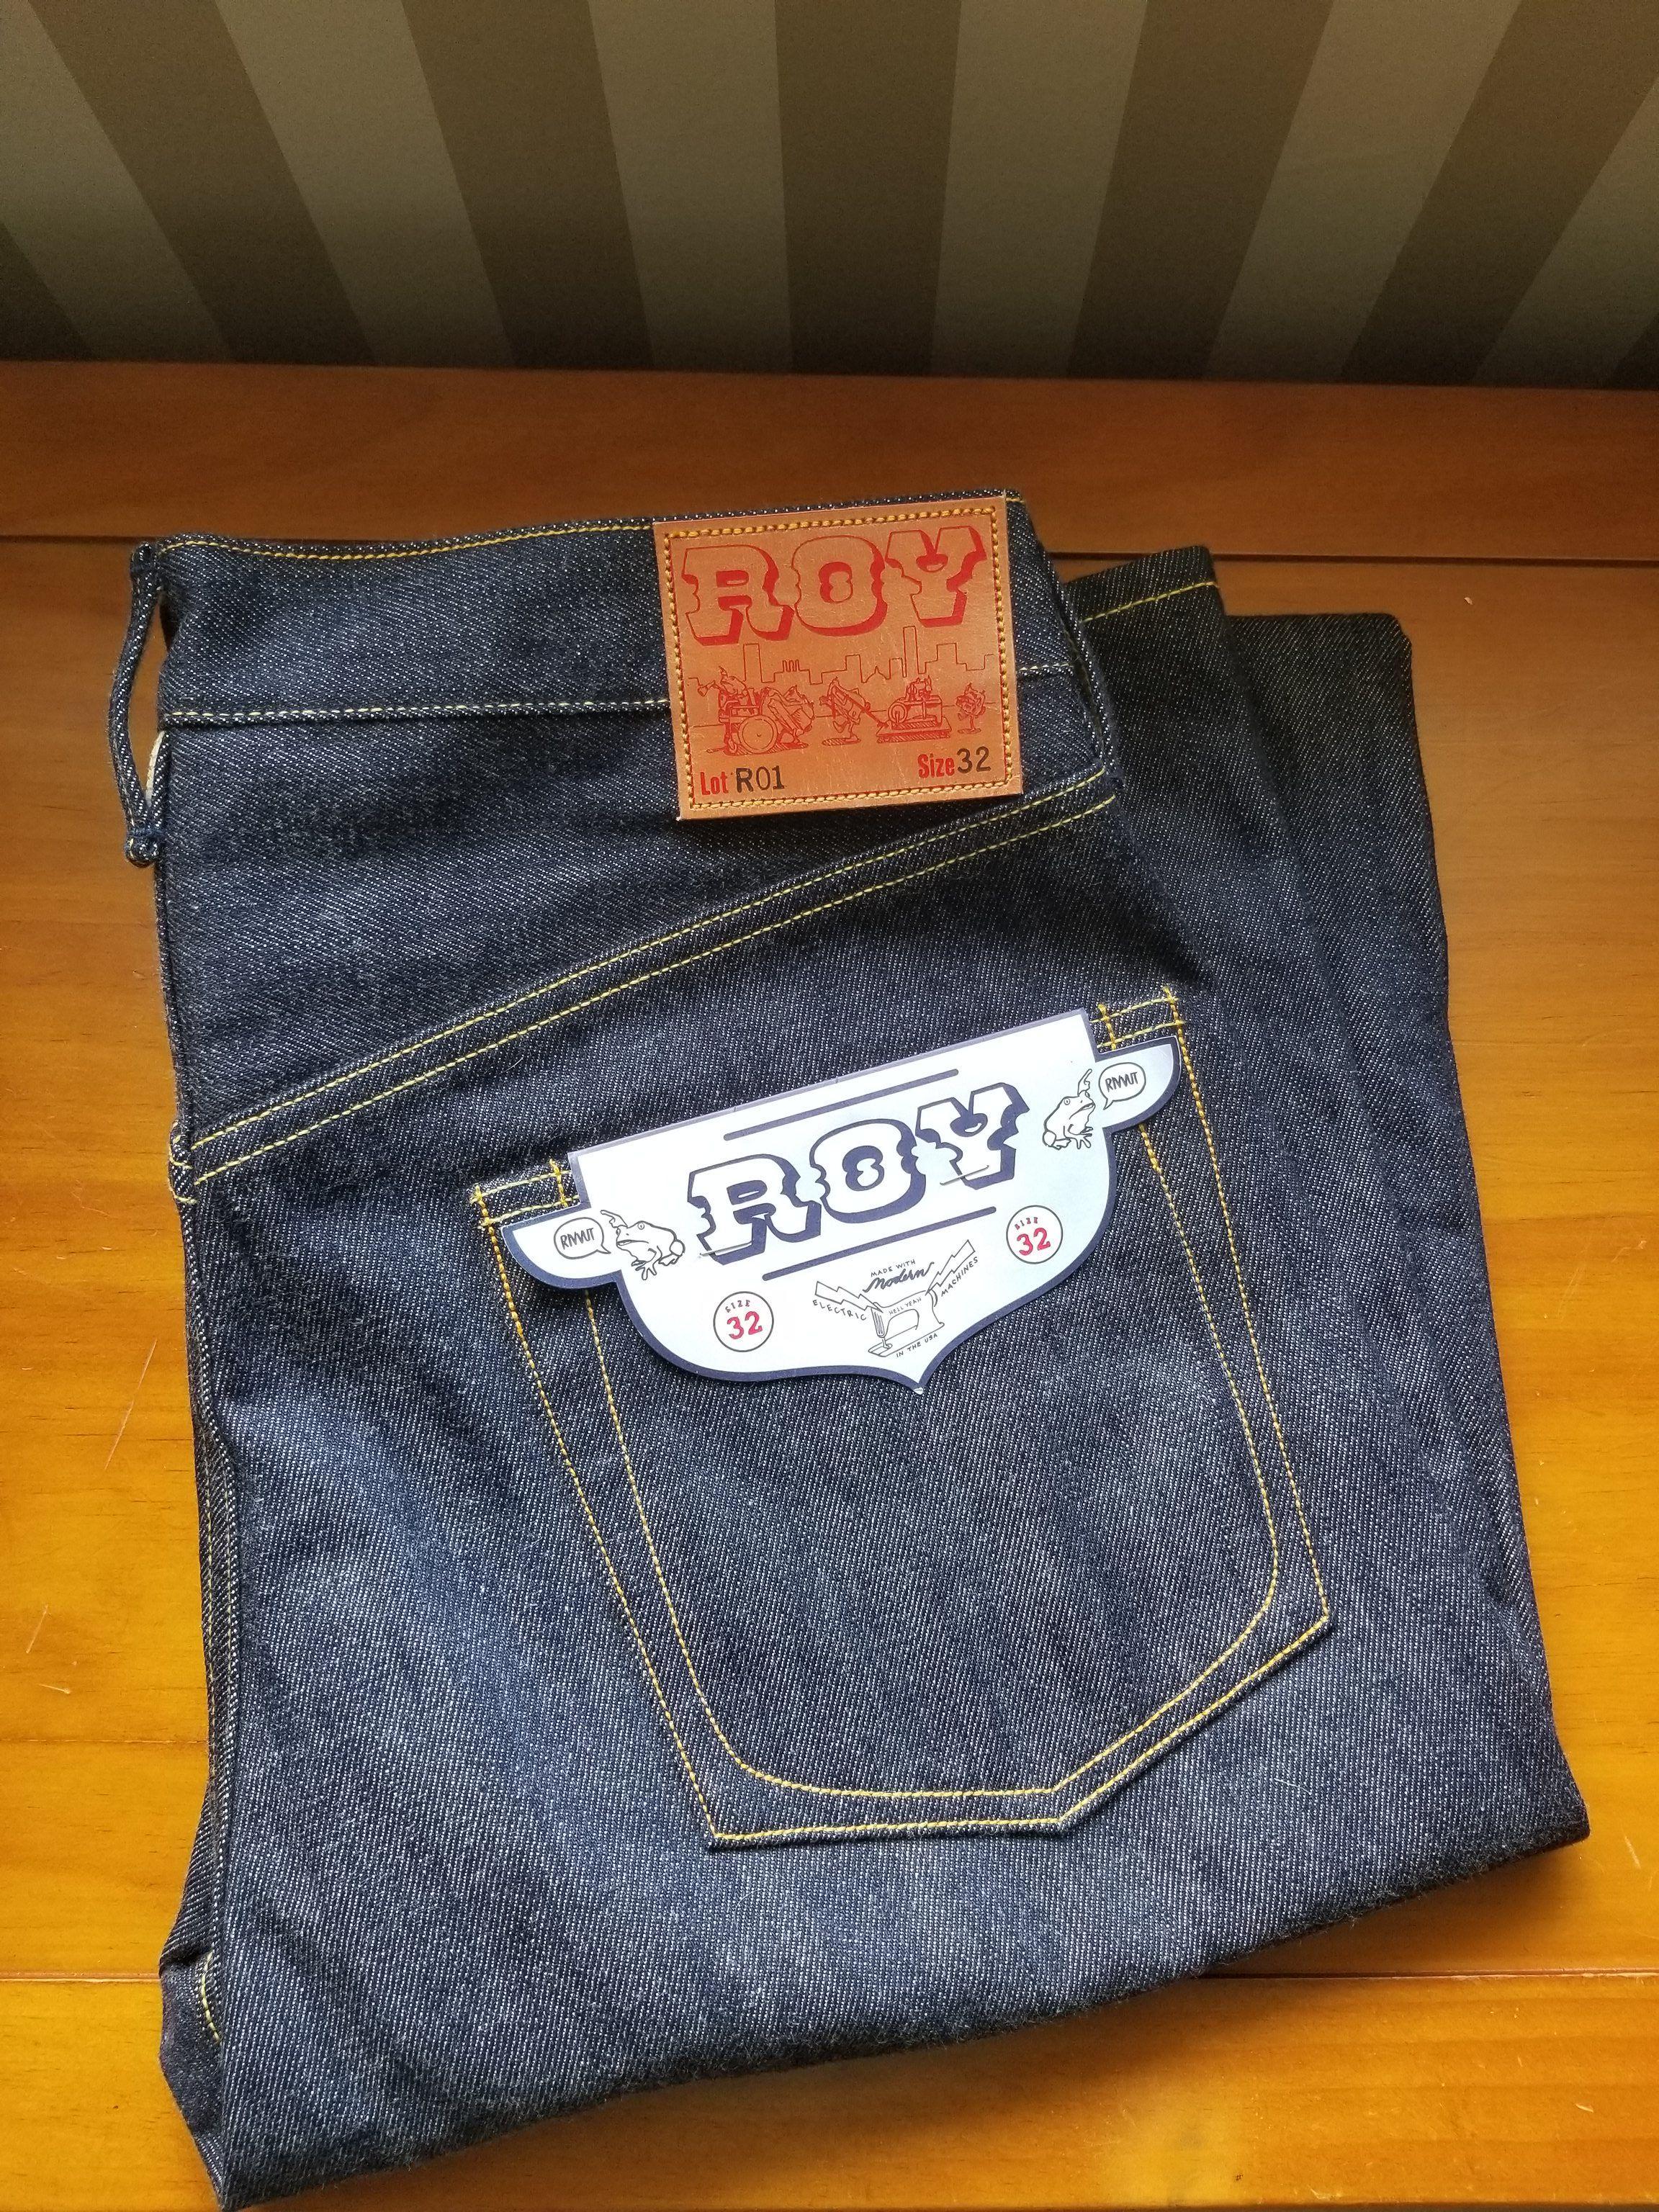 Sold - Roy R01 denim jeans size 32